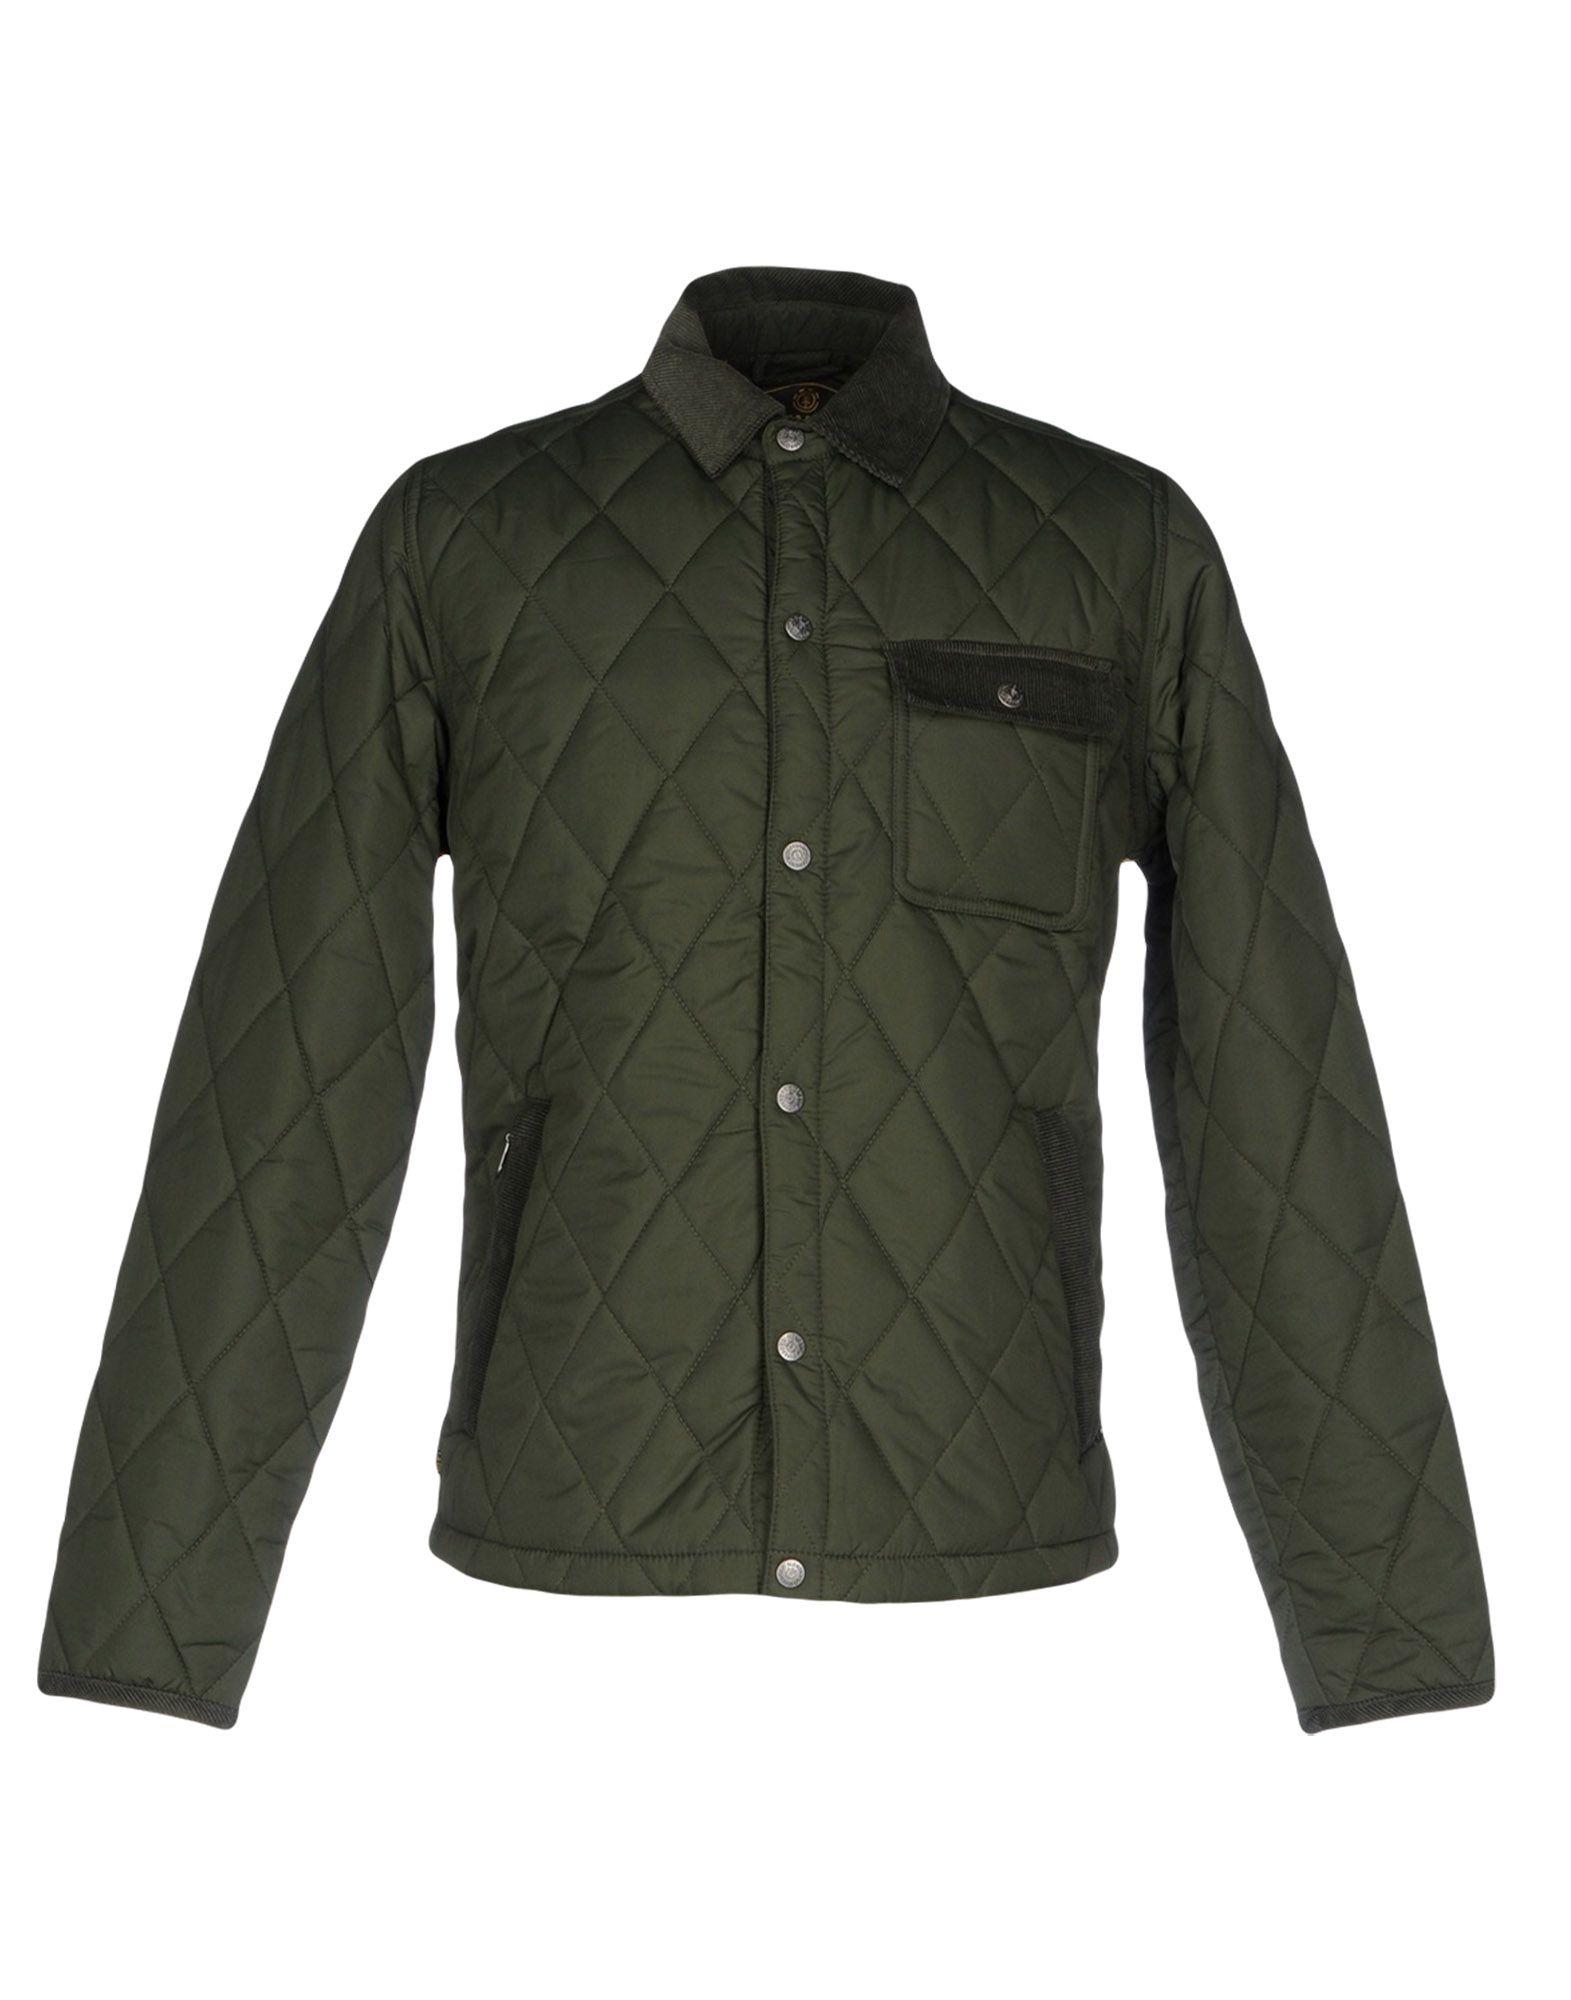 ELEMENT WOLFEBORO COLLECTION Куртка element emerald collection свитер